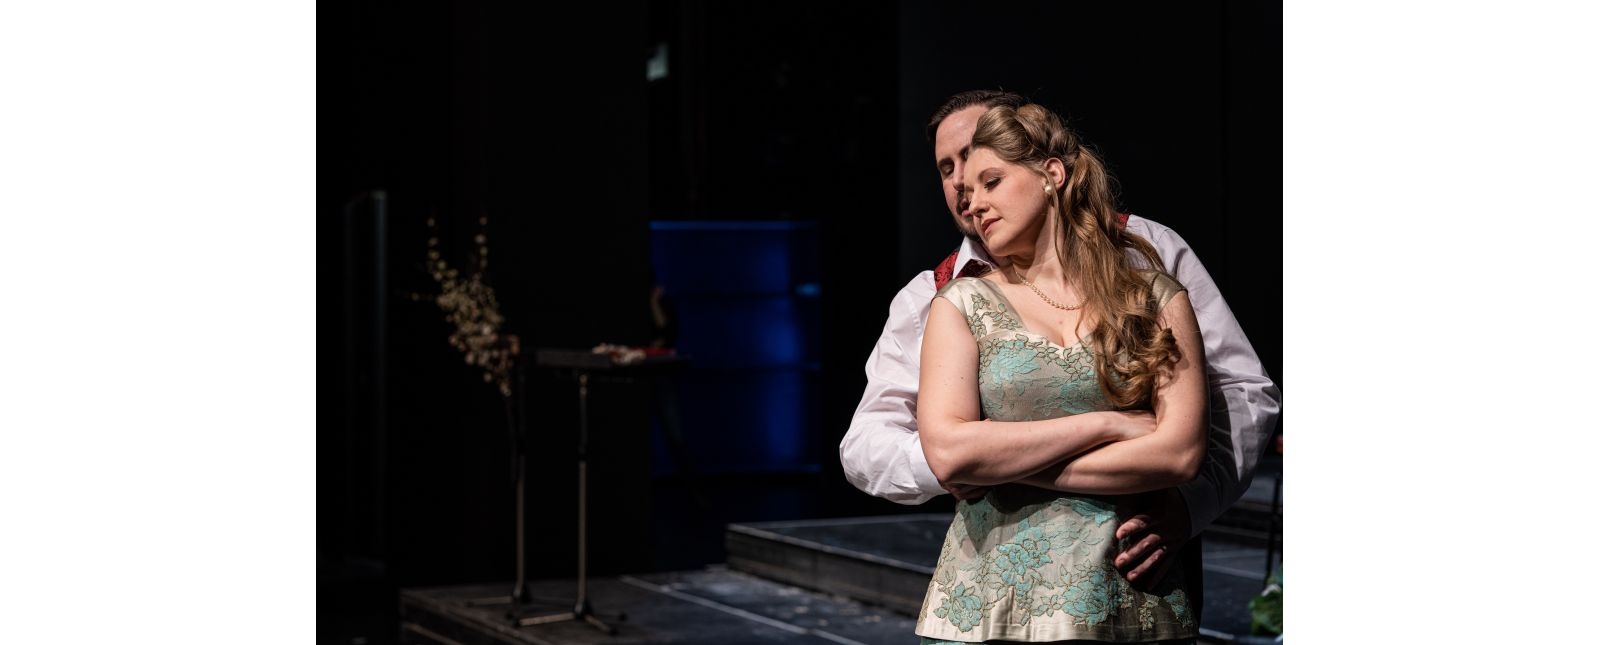 Kosmos Korngold // Jeff Gwaltney / Arminia Friebe // 2020 // Britt Schilling